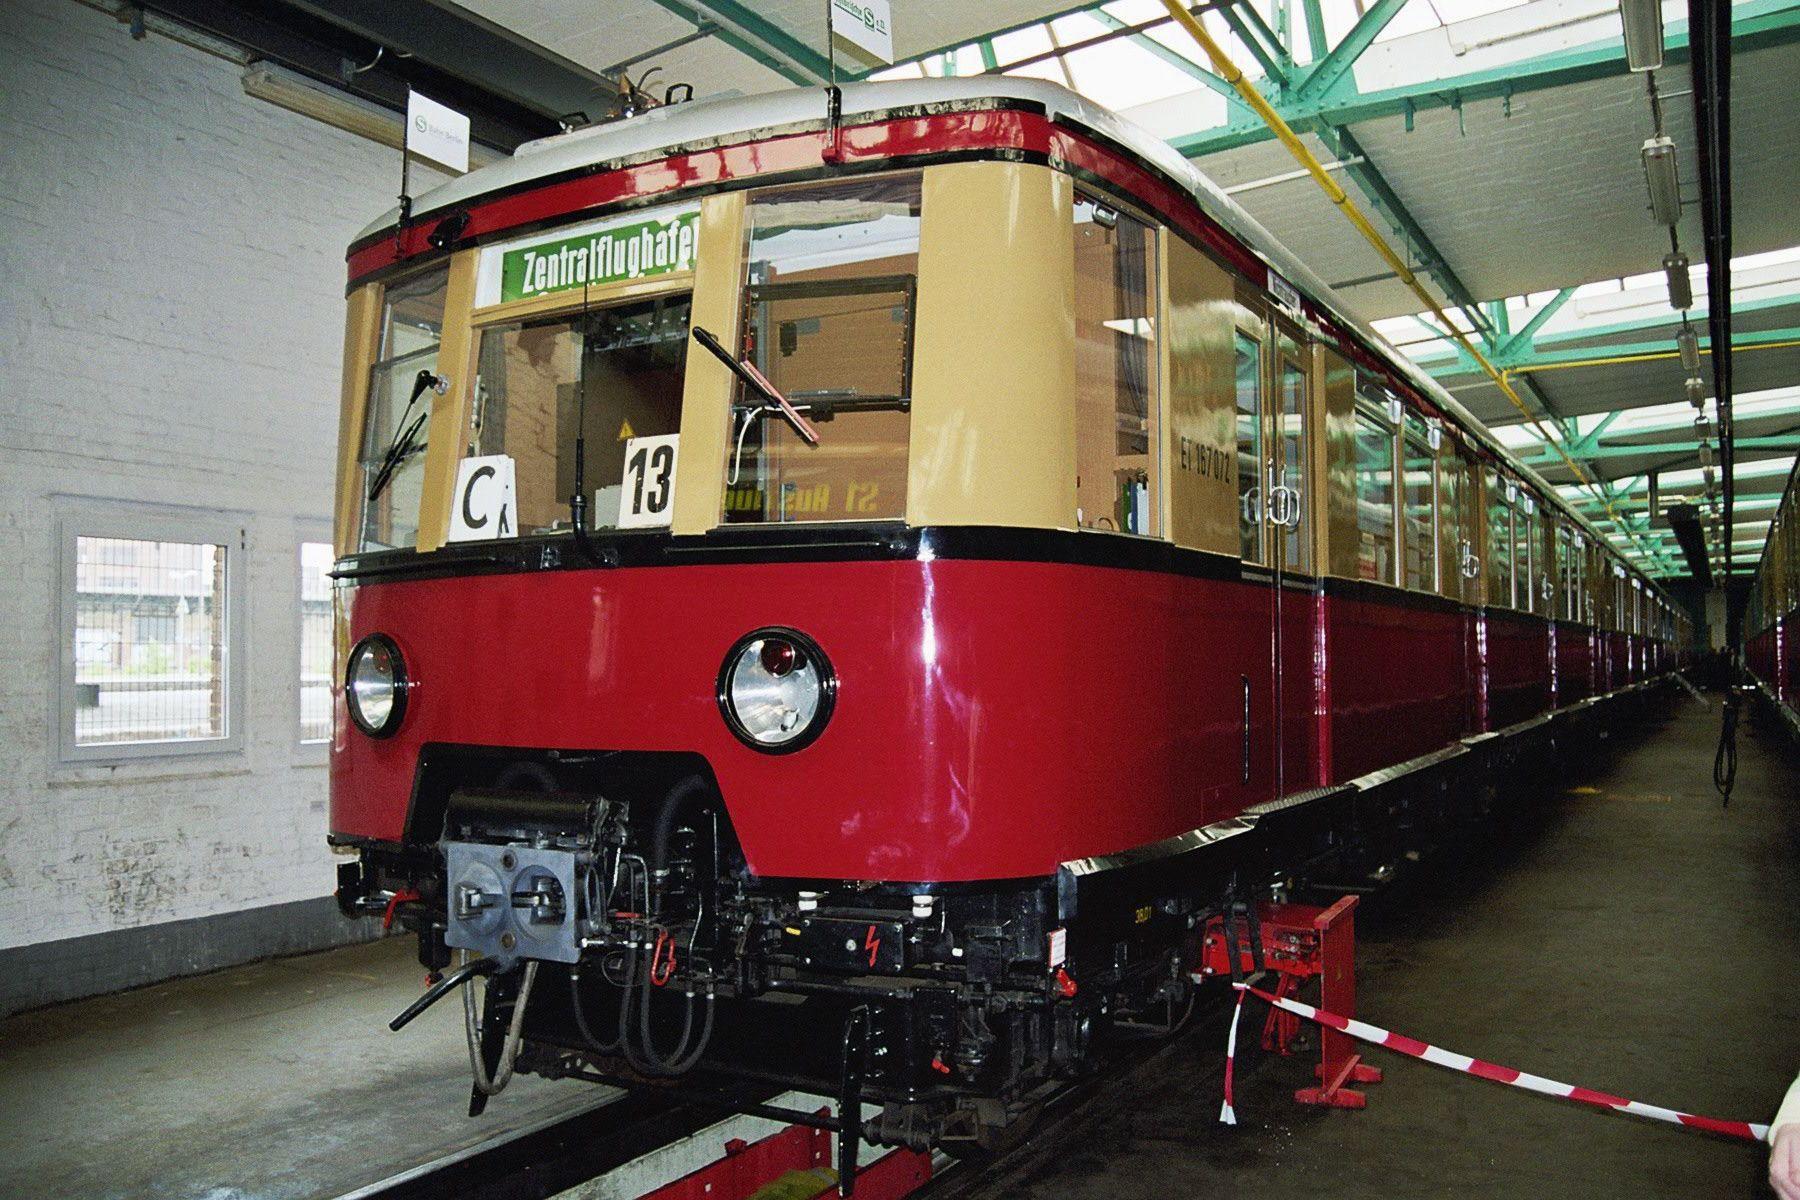 S-Bahn 167 072, Bauart 1938/1941, ex 277 087, Baureihe 167, Erkner, 2005